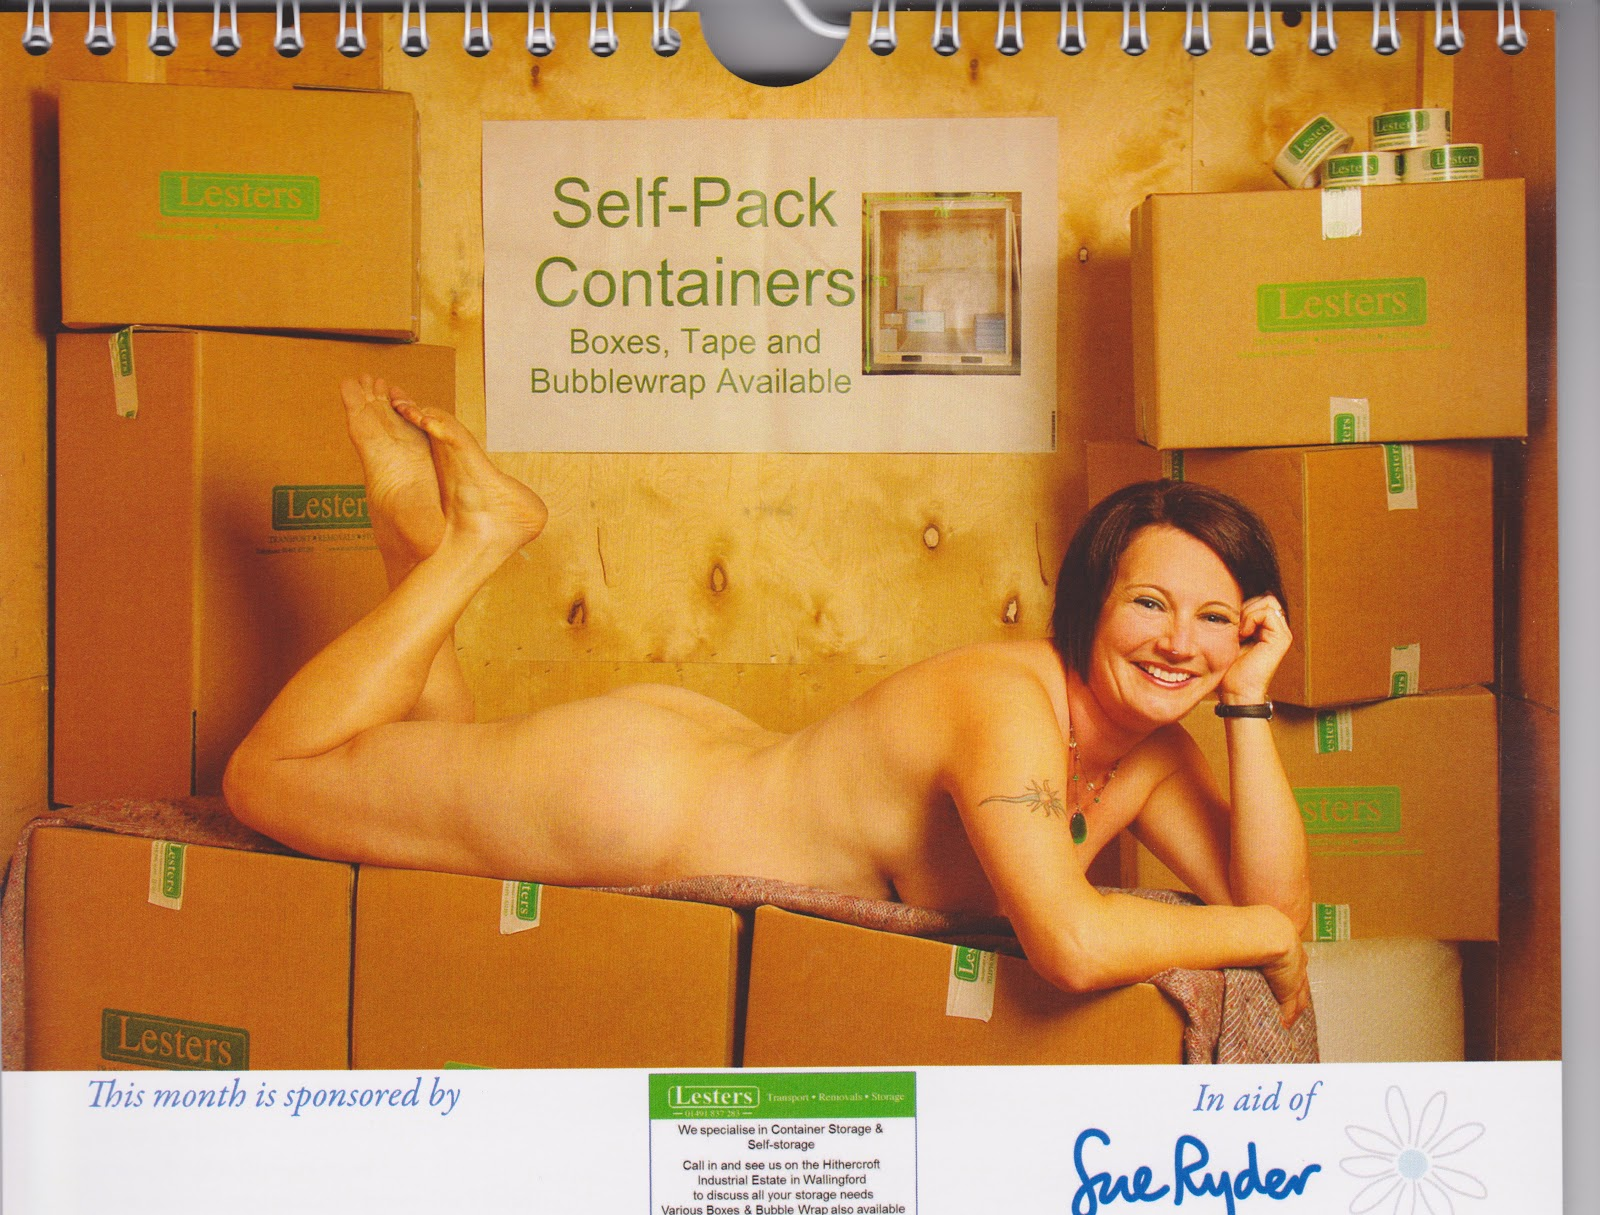 pacificgirls555 philadelphia pa escort services nicole garcia nude